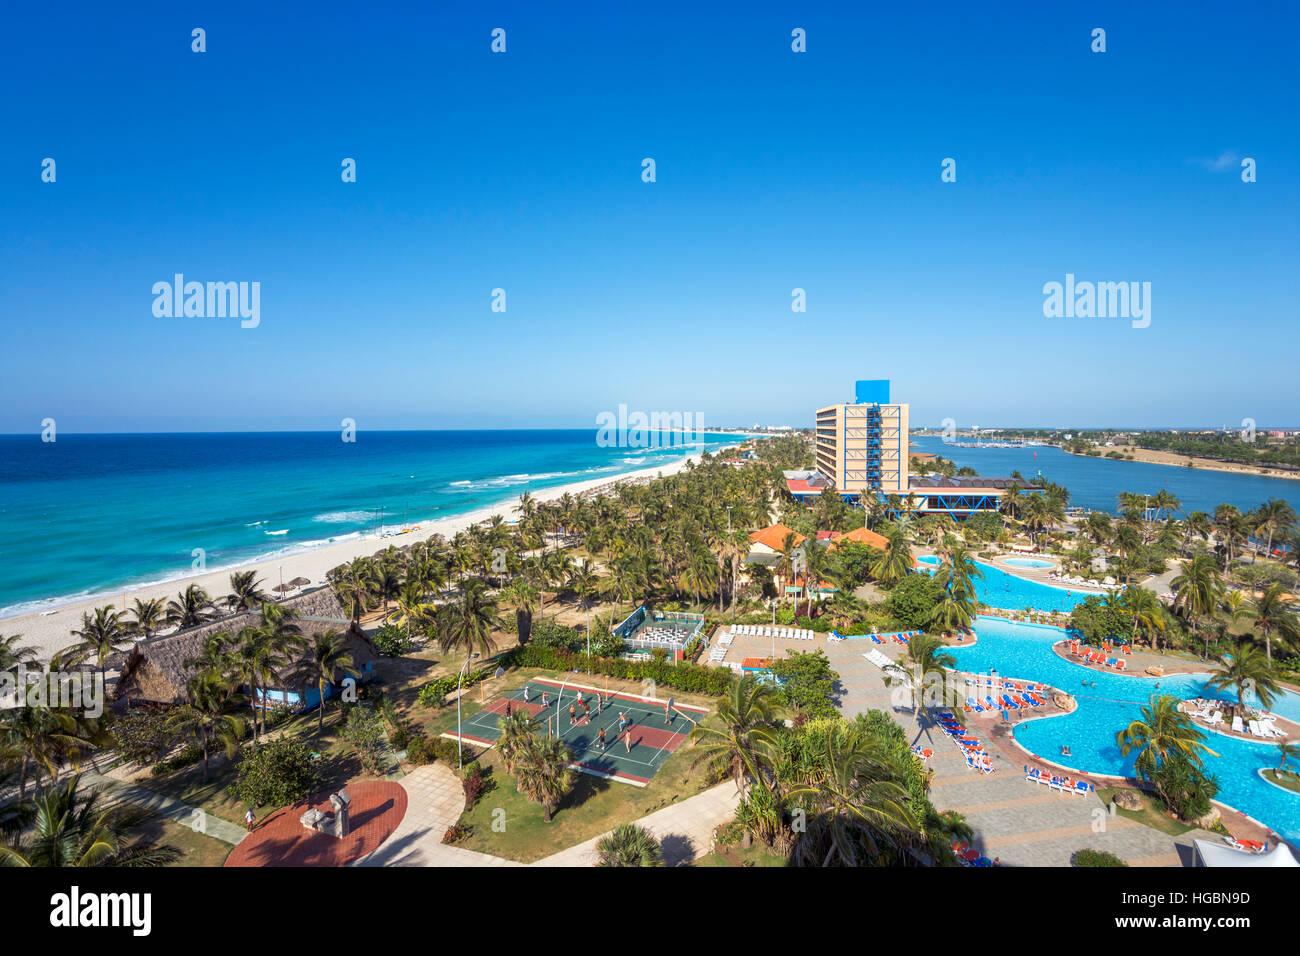 Stock photo varadero beach cuba view over the resort from the gran caribe club puntarena hotel